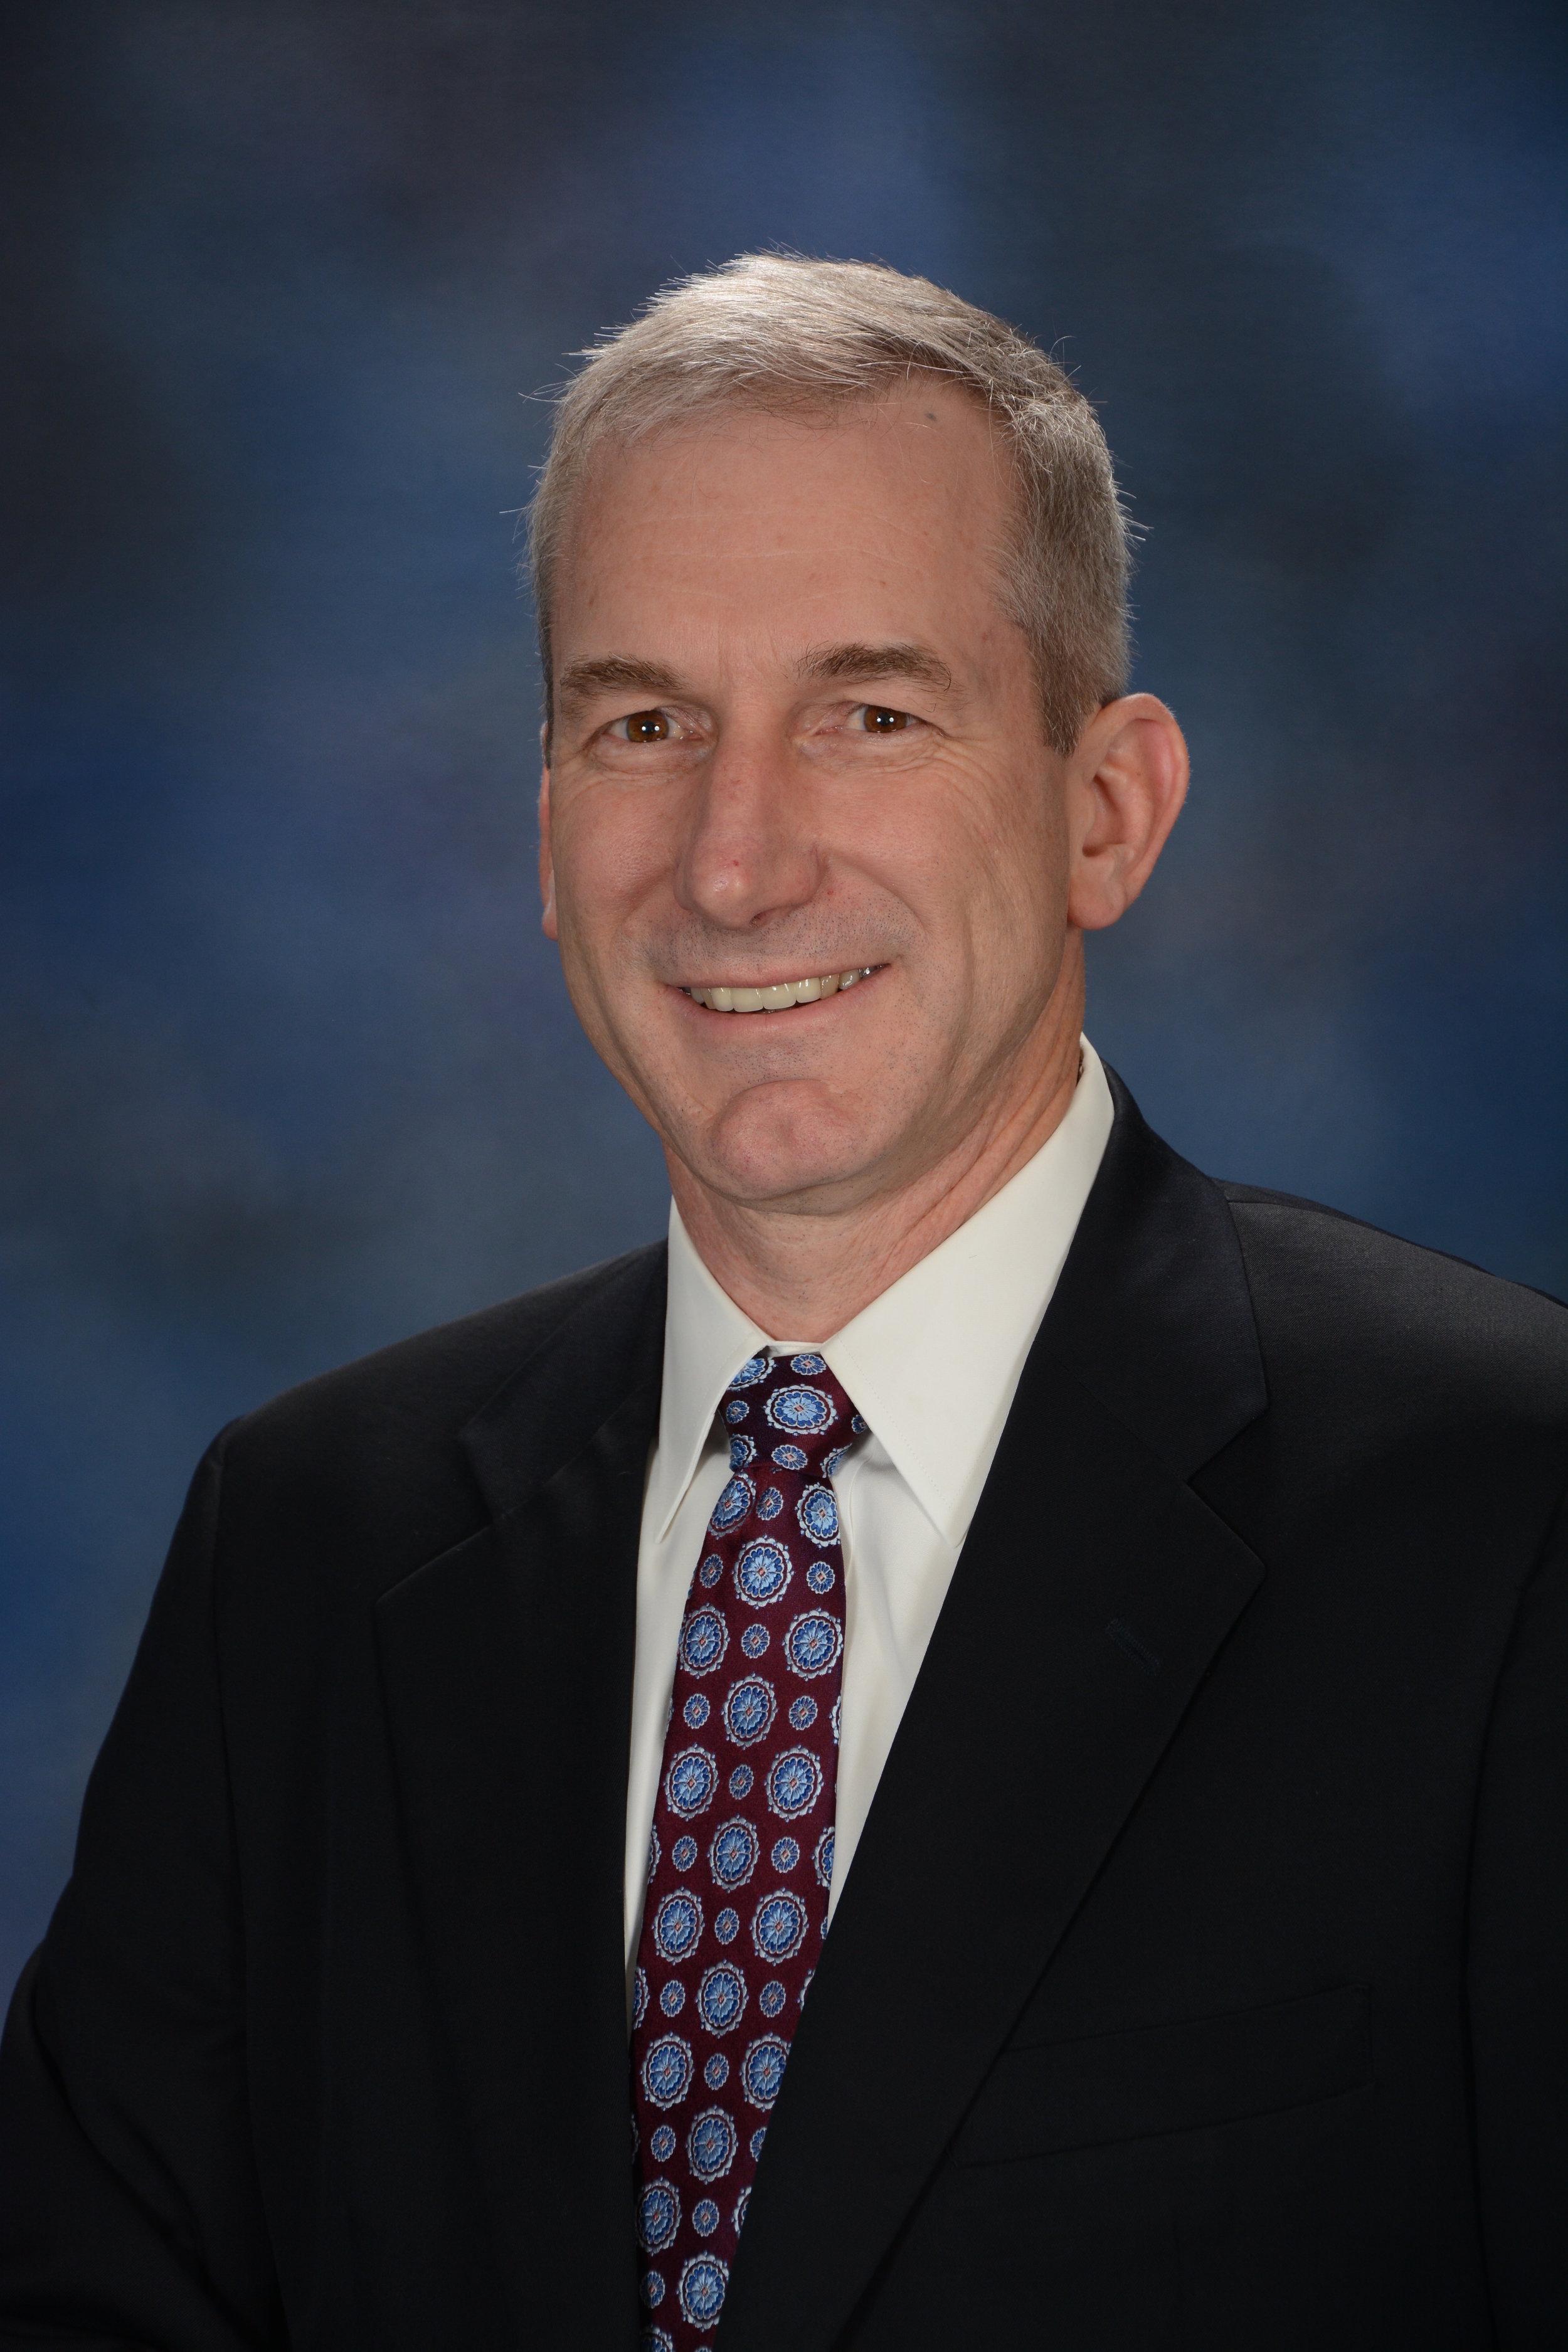 David Widmann,  President & CEO, Konica Minolta Healthcare Americas